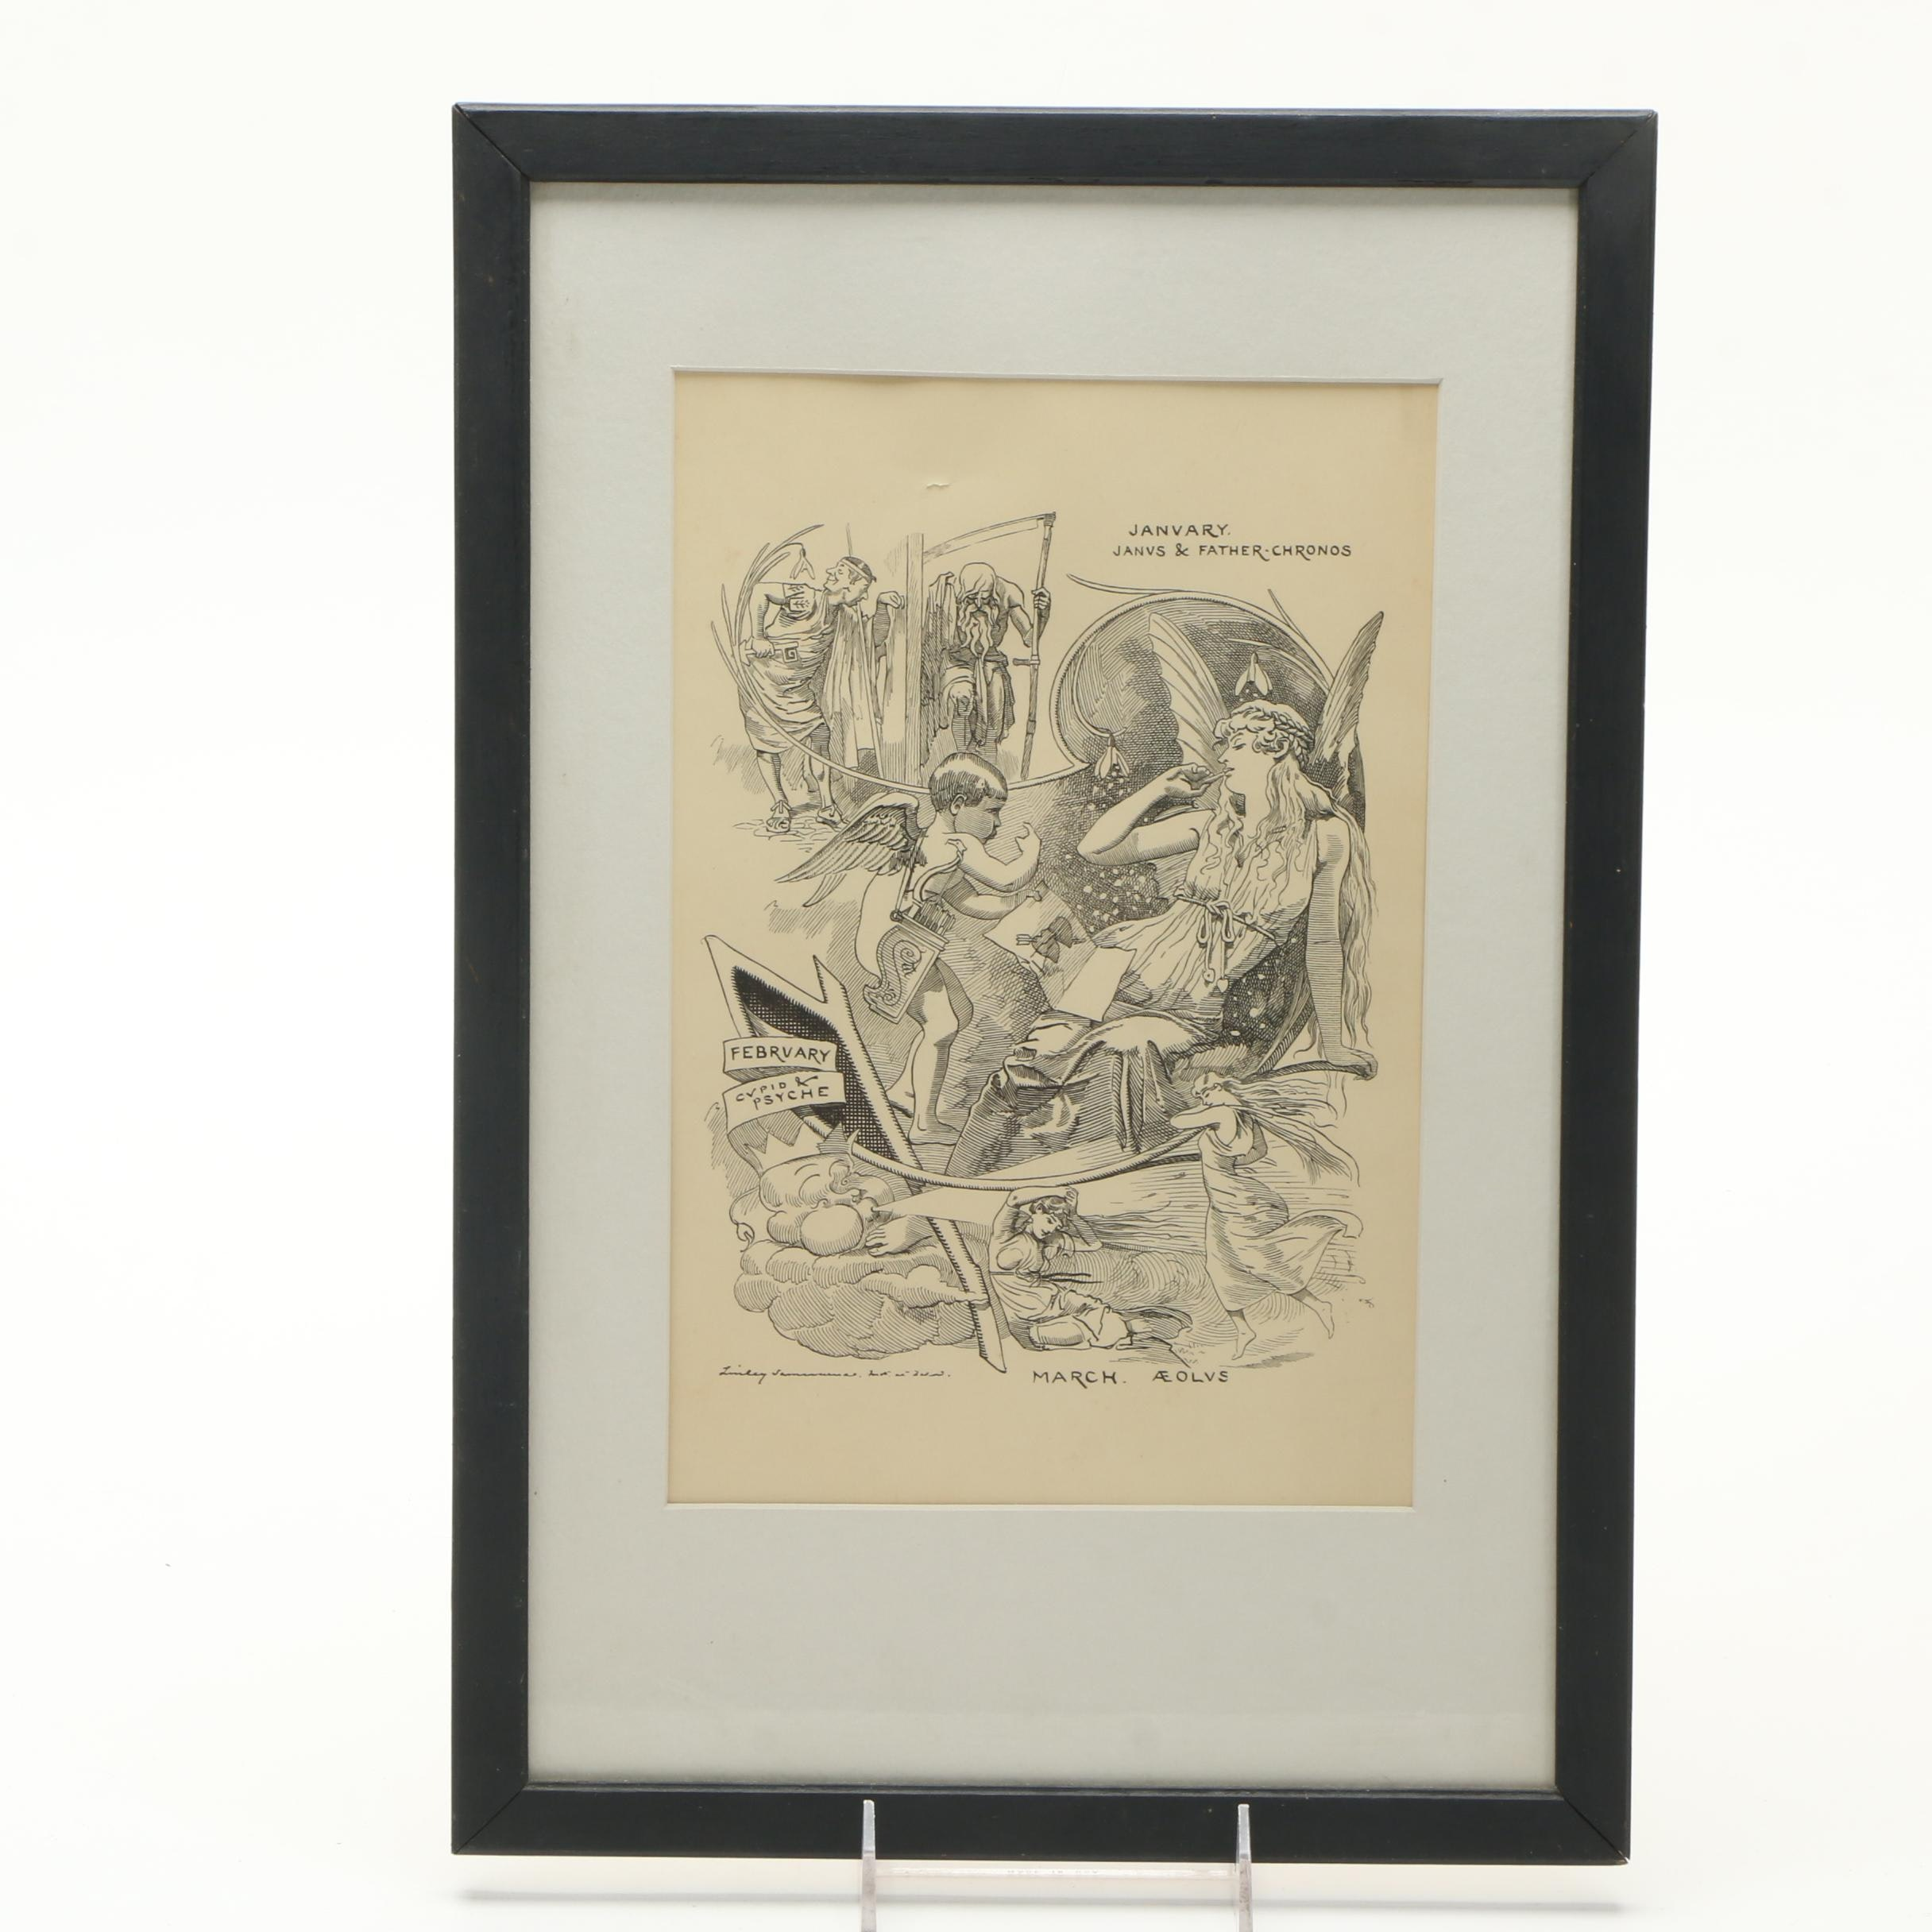 Edward Linley Sambourne Engraving on Paper